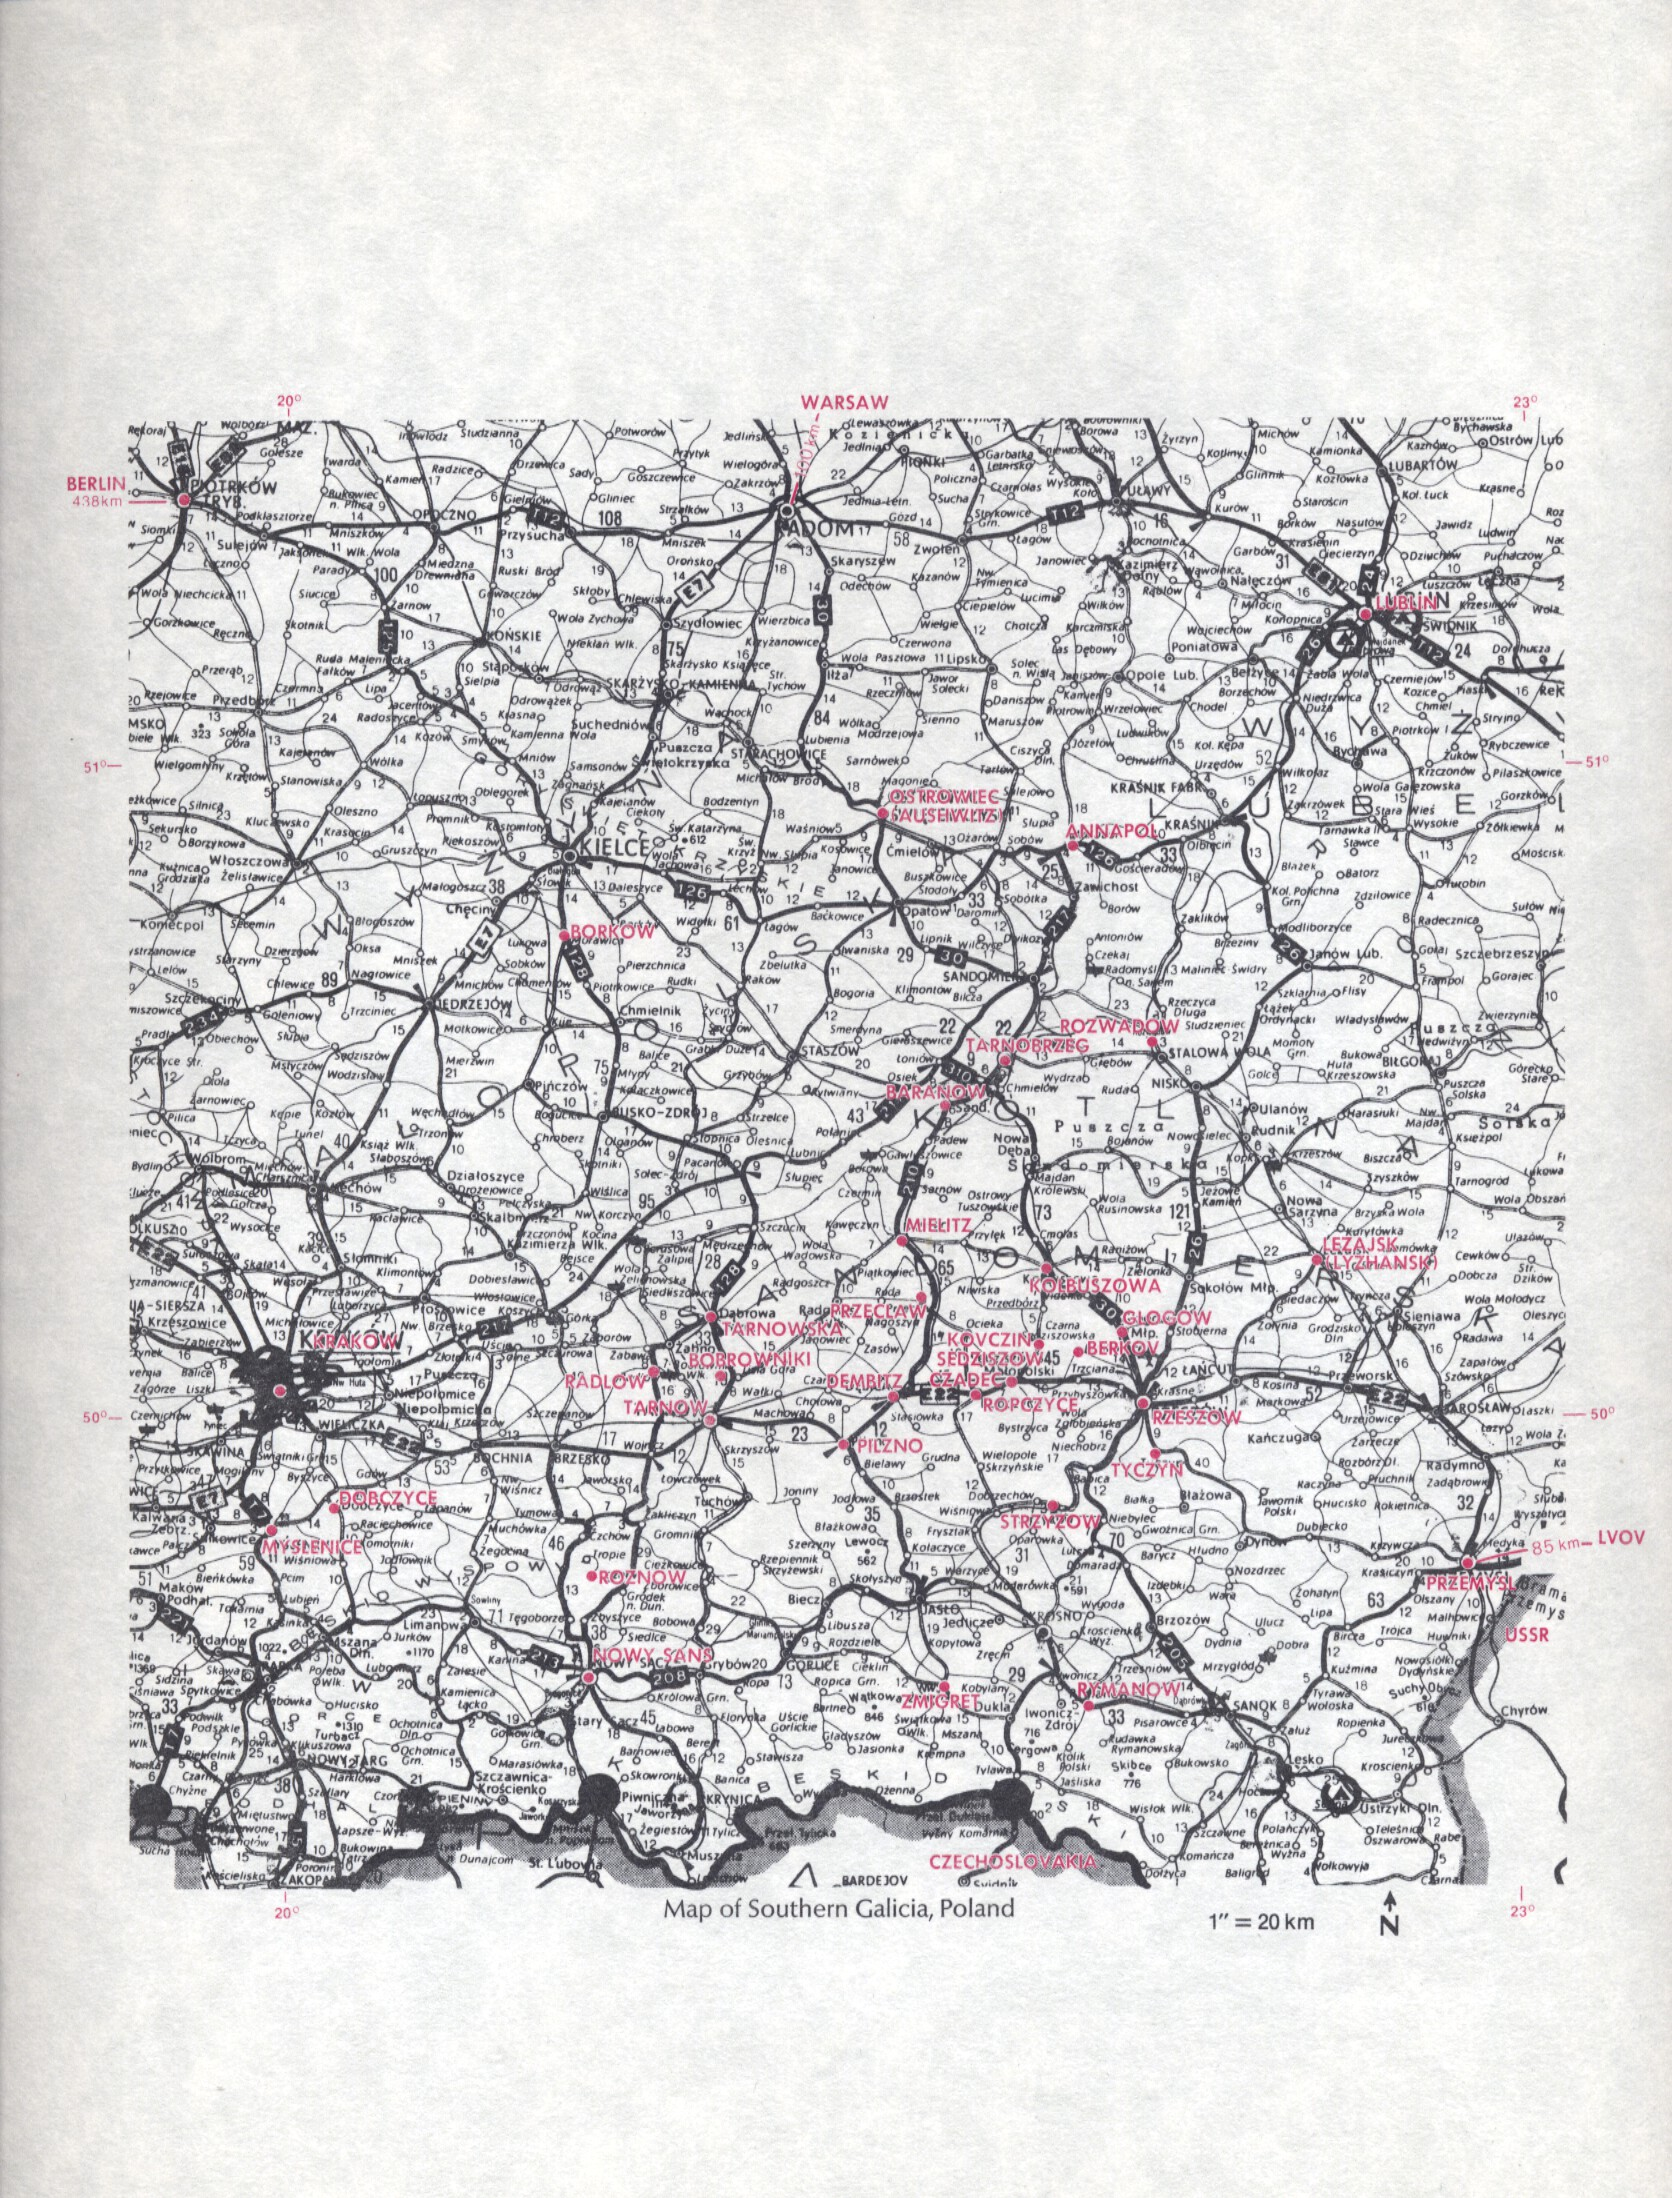 Onezer search image jack - 6 Map Of Southern Galicia Poland